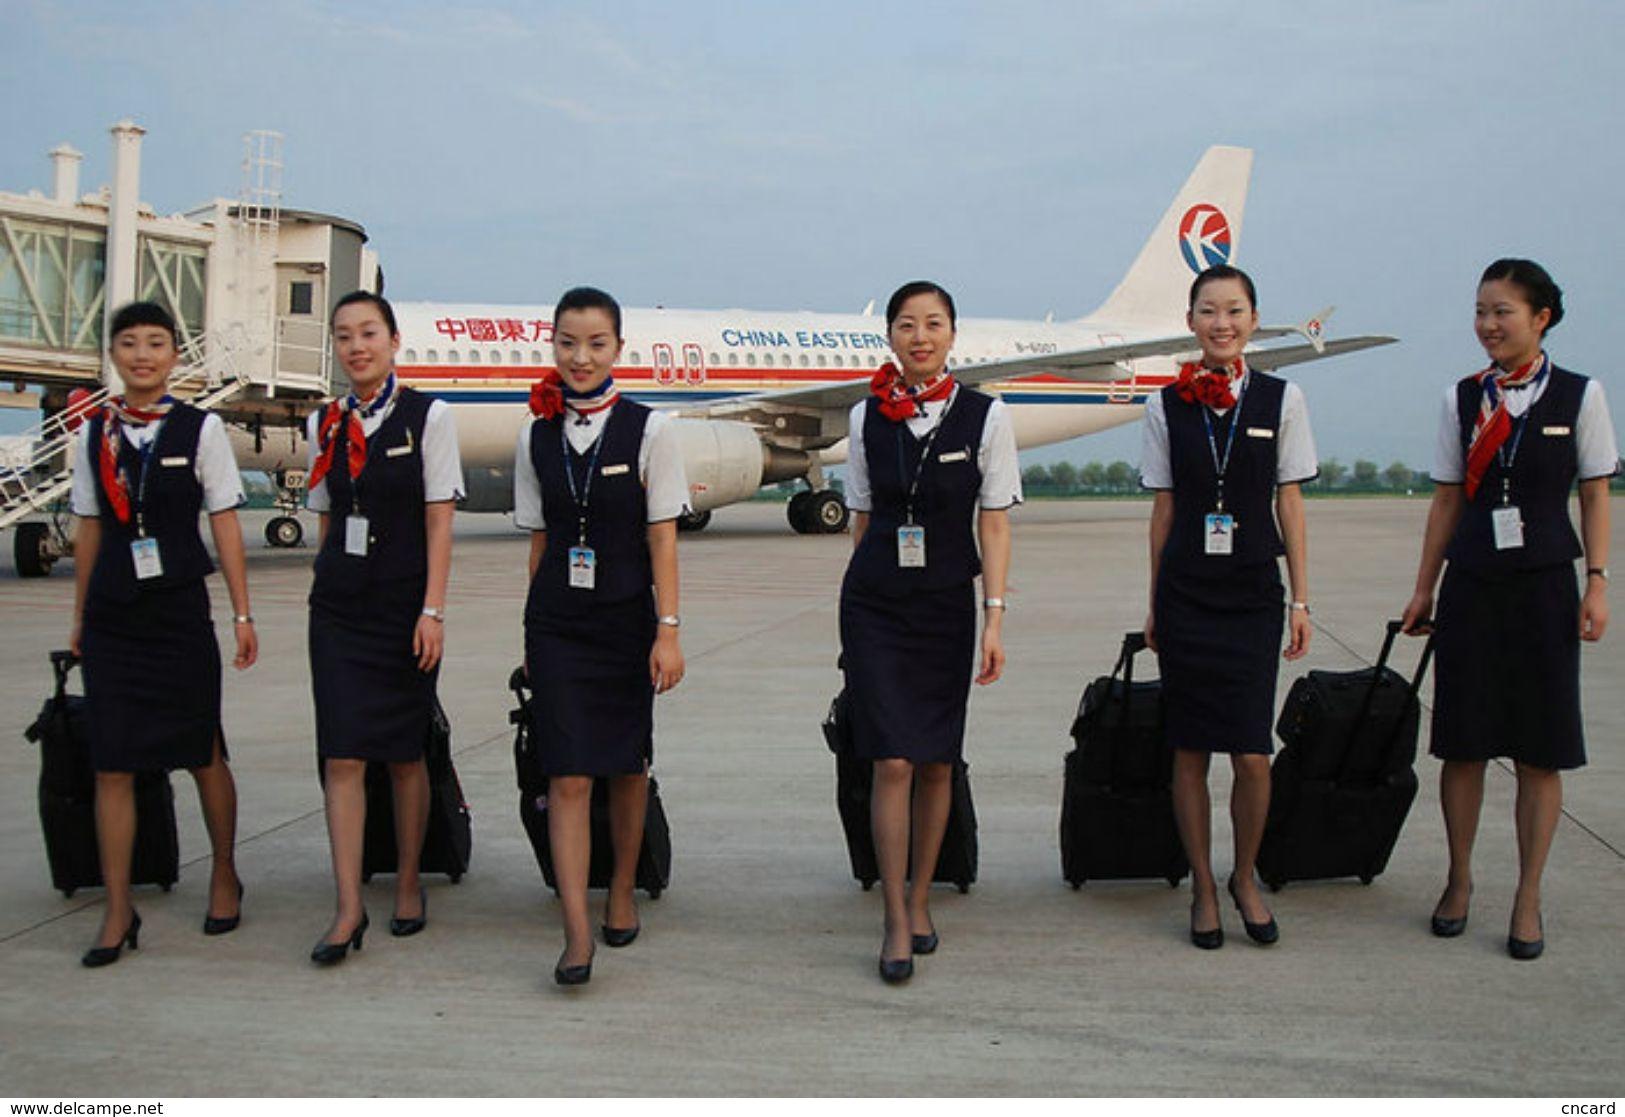 T80-078  ]  Flight Attendants Air Attendants Stewardesses Hostesses Cabin Crew , China Pre-paid Card, Postal Statioery - Jobs